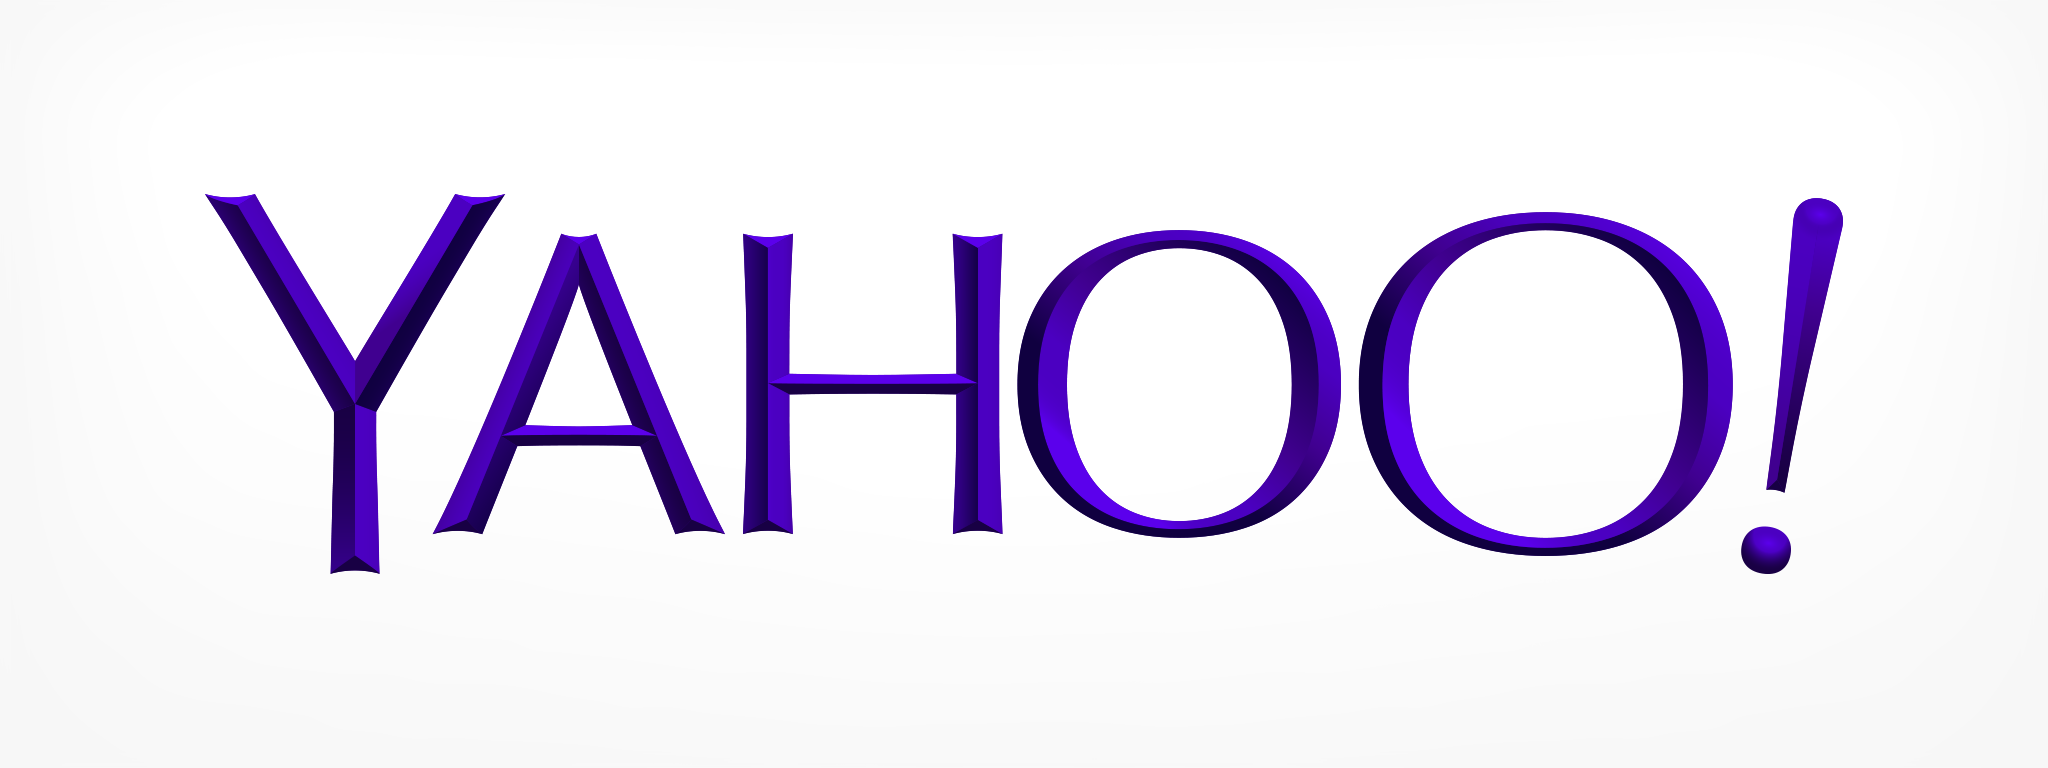 Yahoo Free Clip Art.